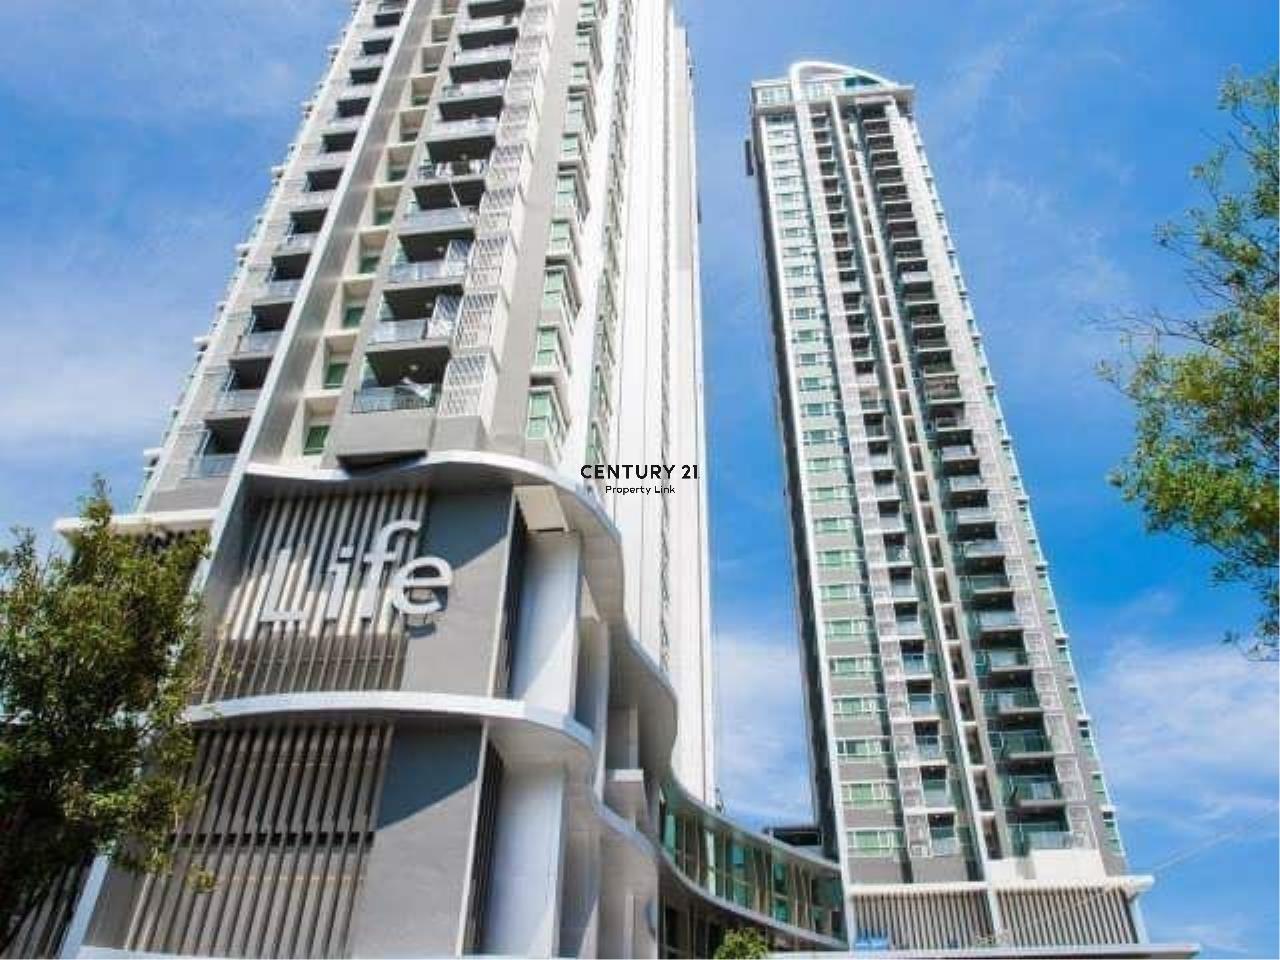 Century21 Property Link Agency's 39-CC-61596 Life Ratchadapisek Condo for Sale 1 bed Condo in bangkok MRT @Suthisarn / @Huai Khwang Sale 4.3 M. 11